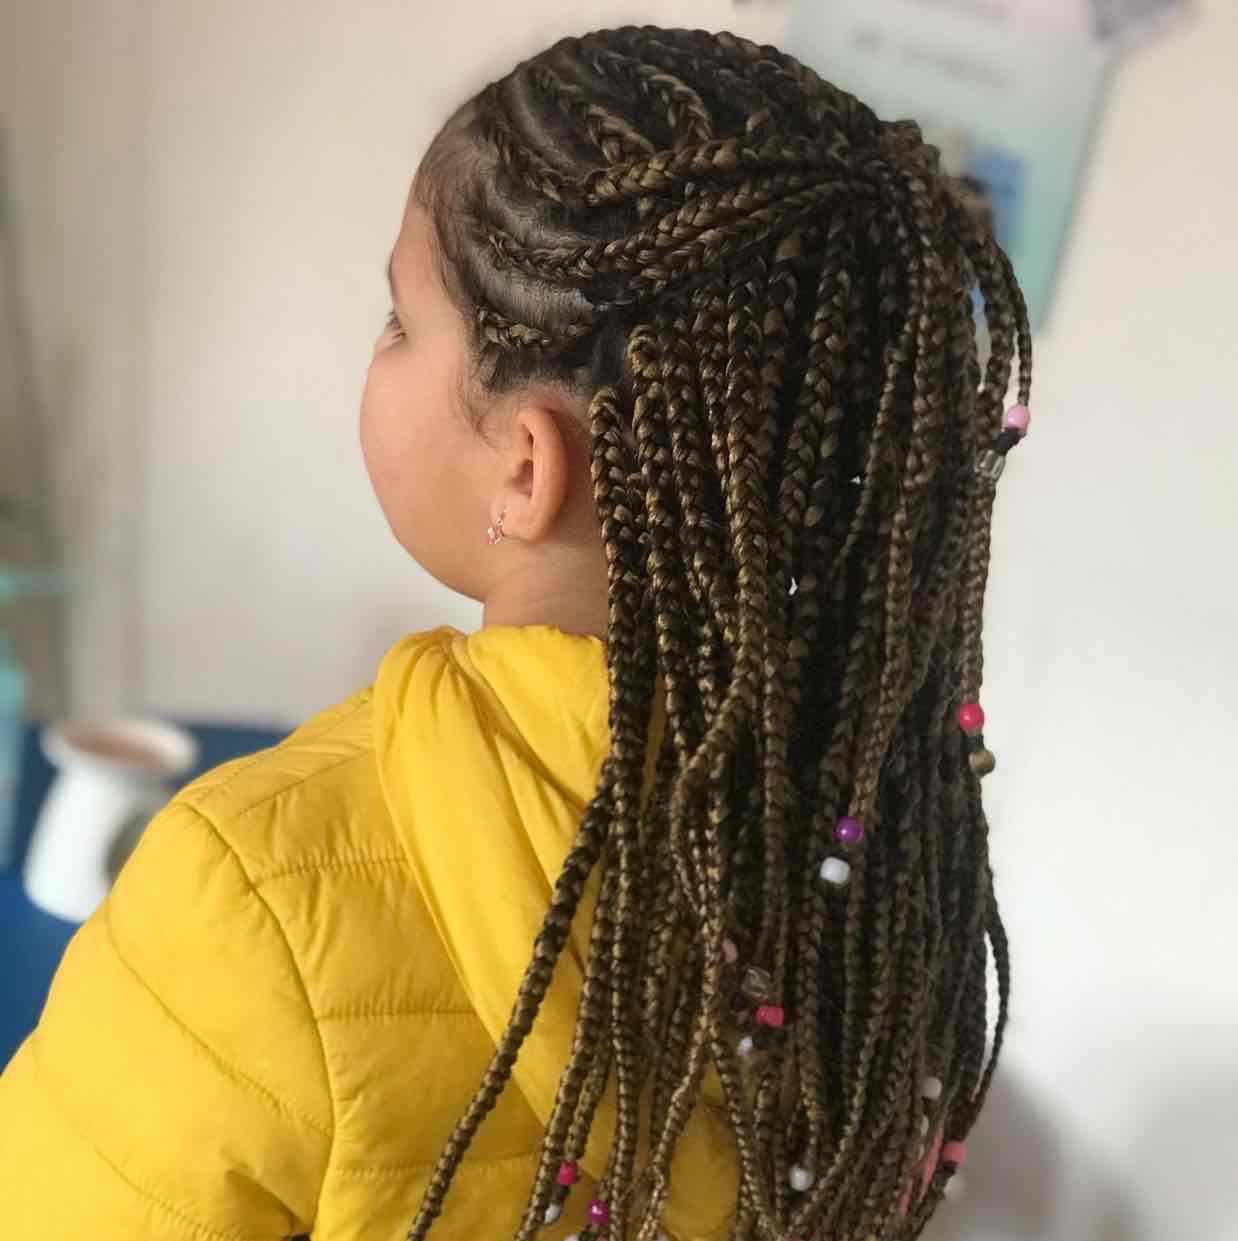 salon de coiffure afro tresse tresses box braids crochet braids vanilles tissages paris 75 77 78 91 92 93 94 95 IXOZTZTS